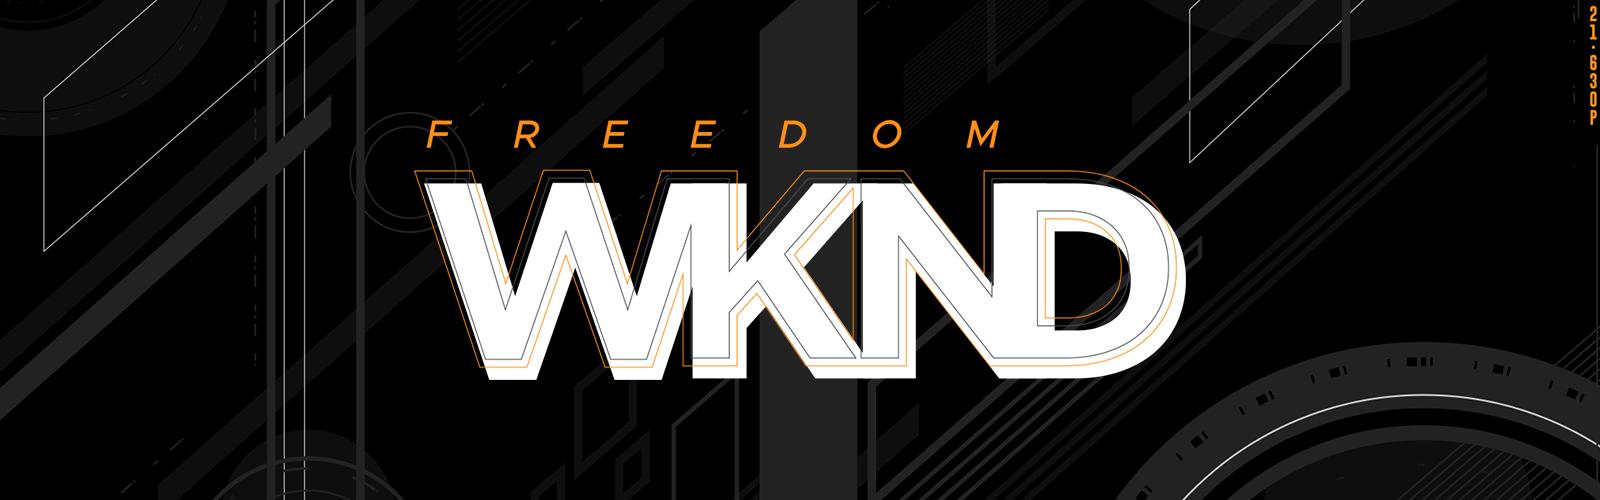 Freedom 2022